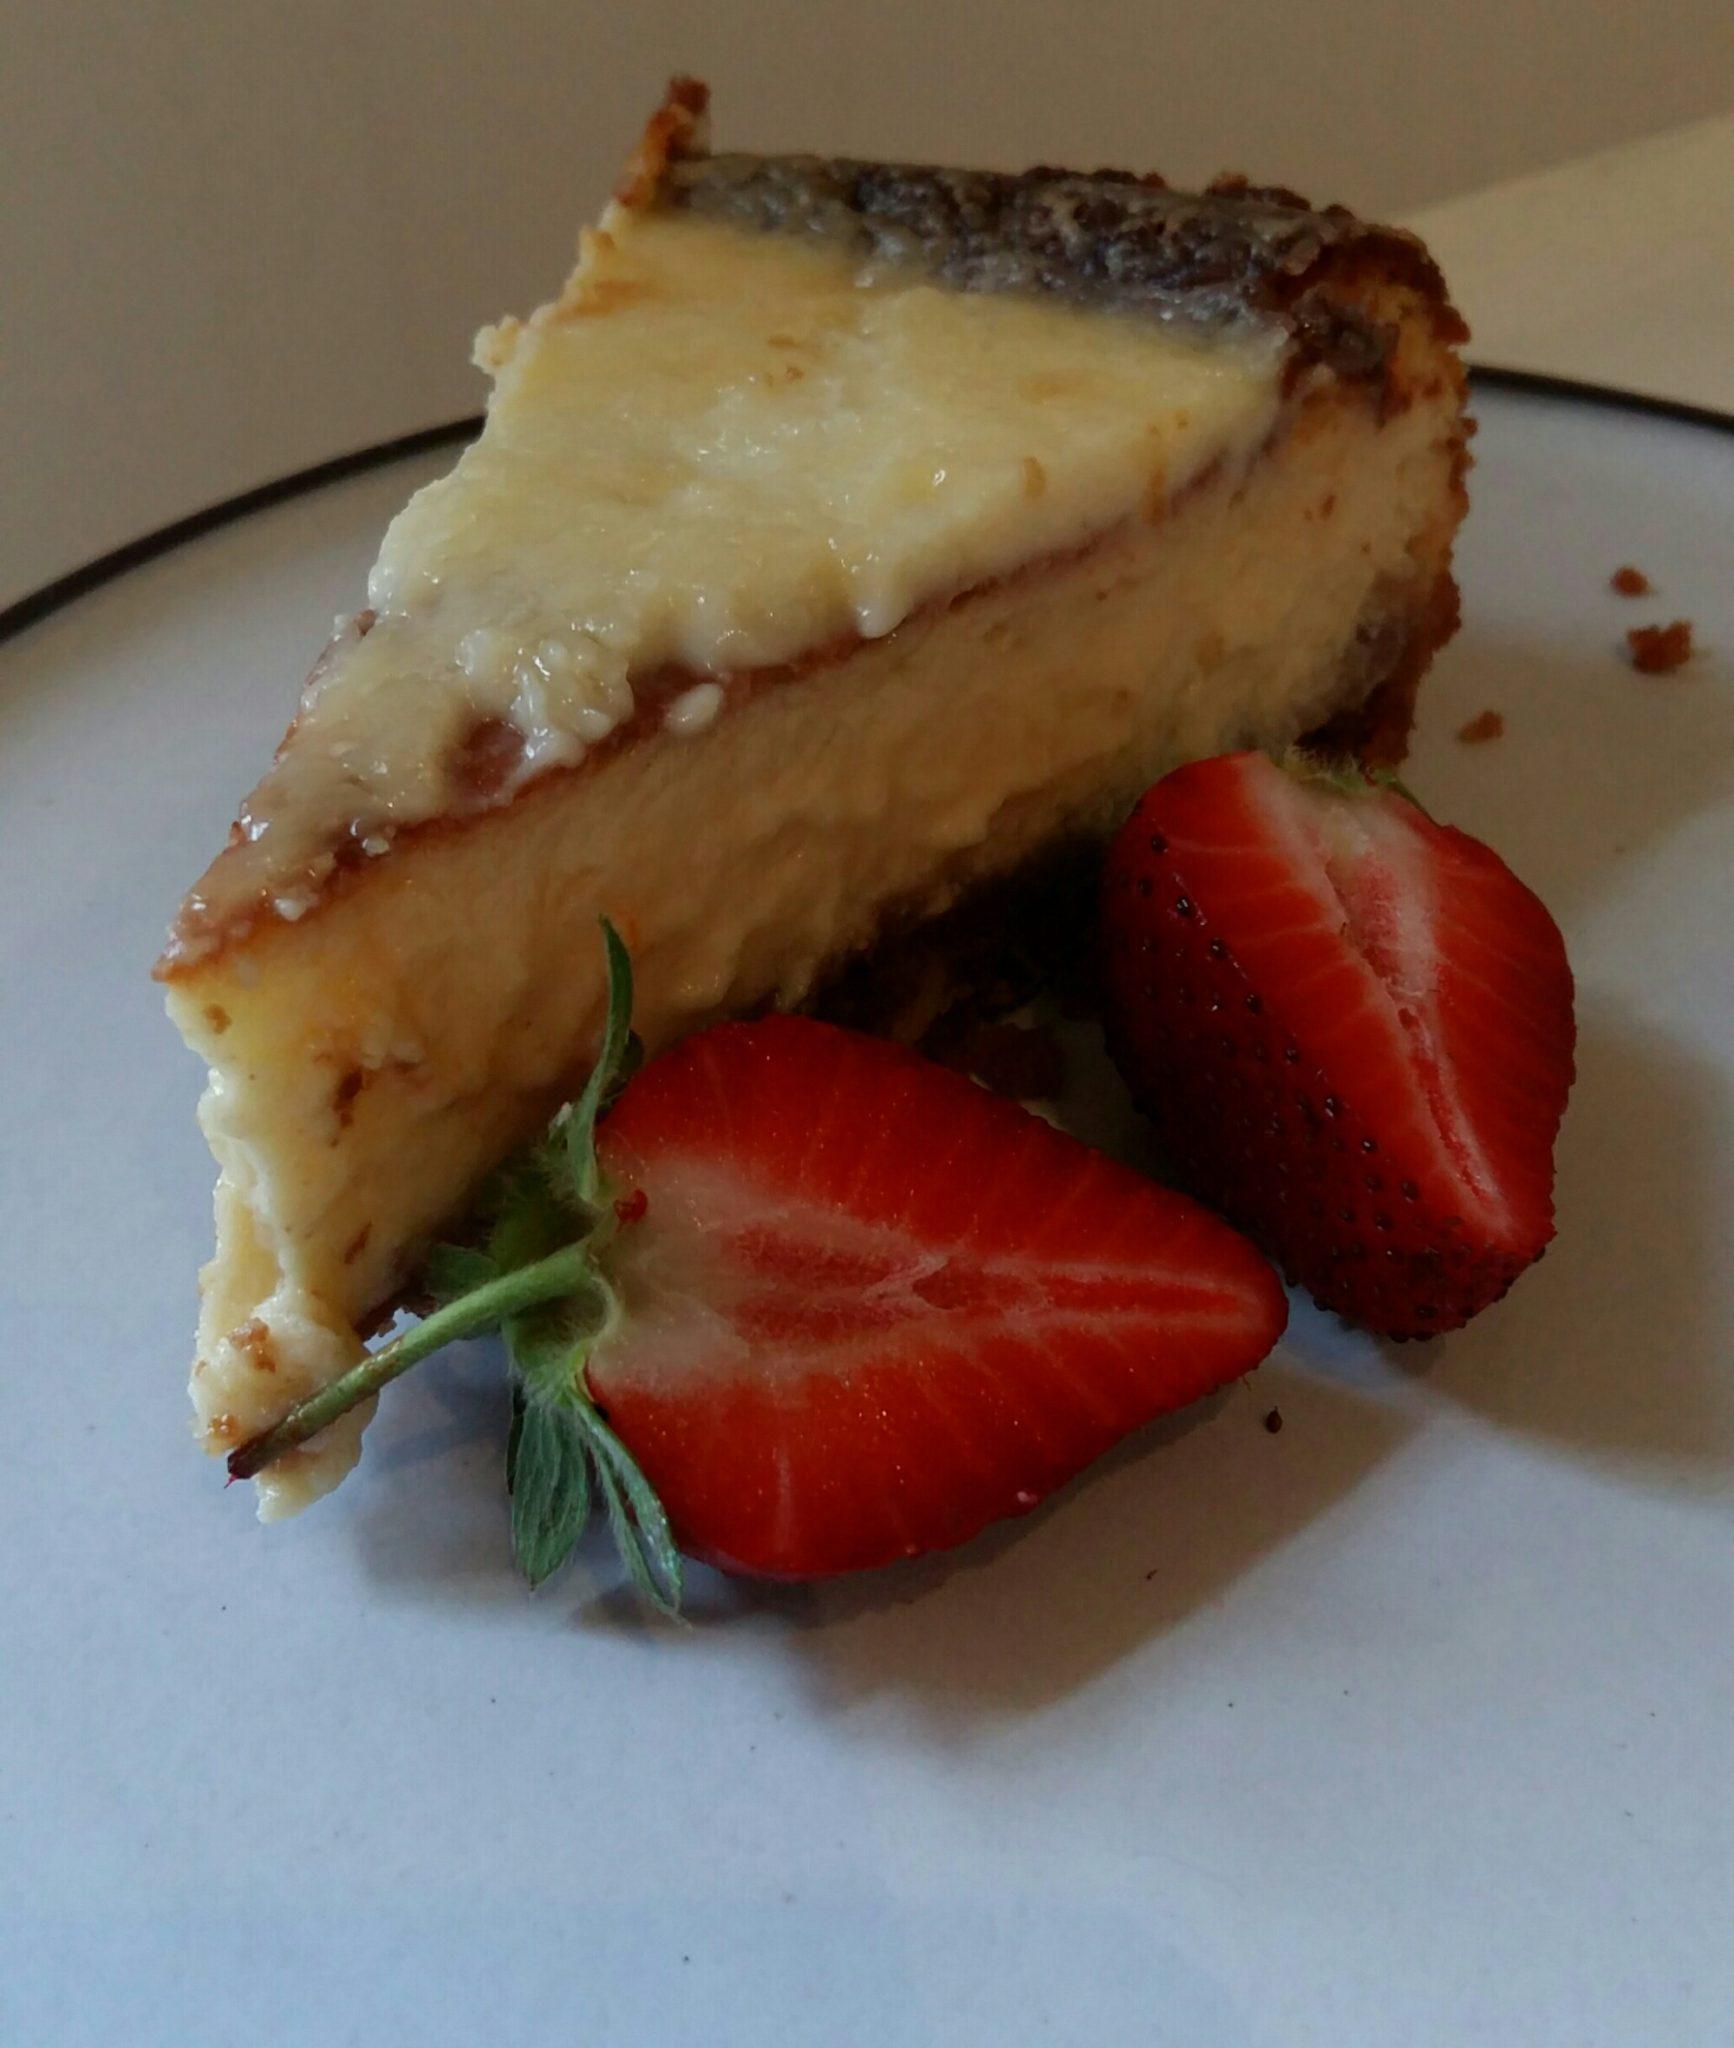 Lemony sour cream cheesecake